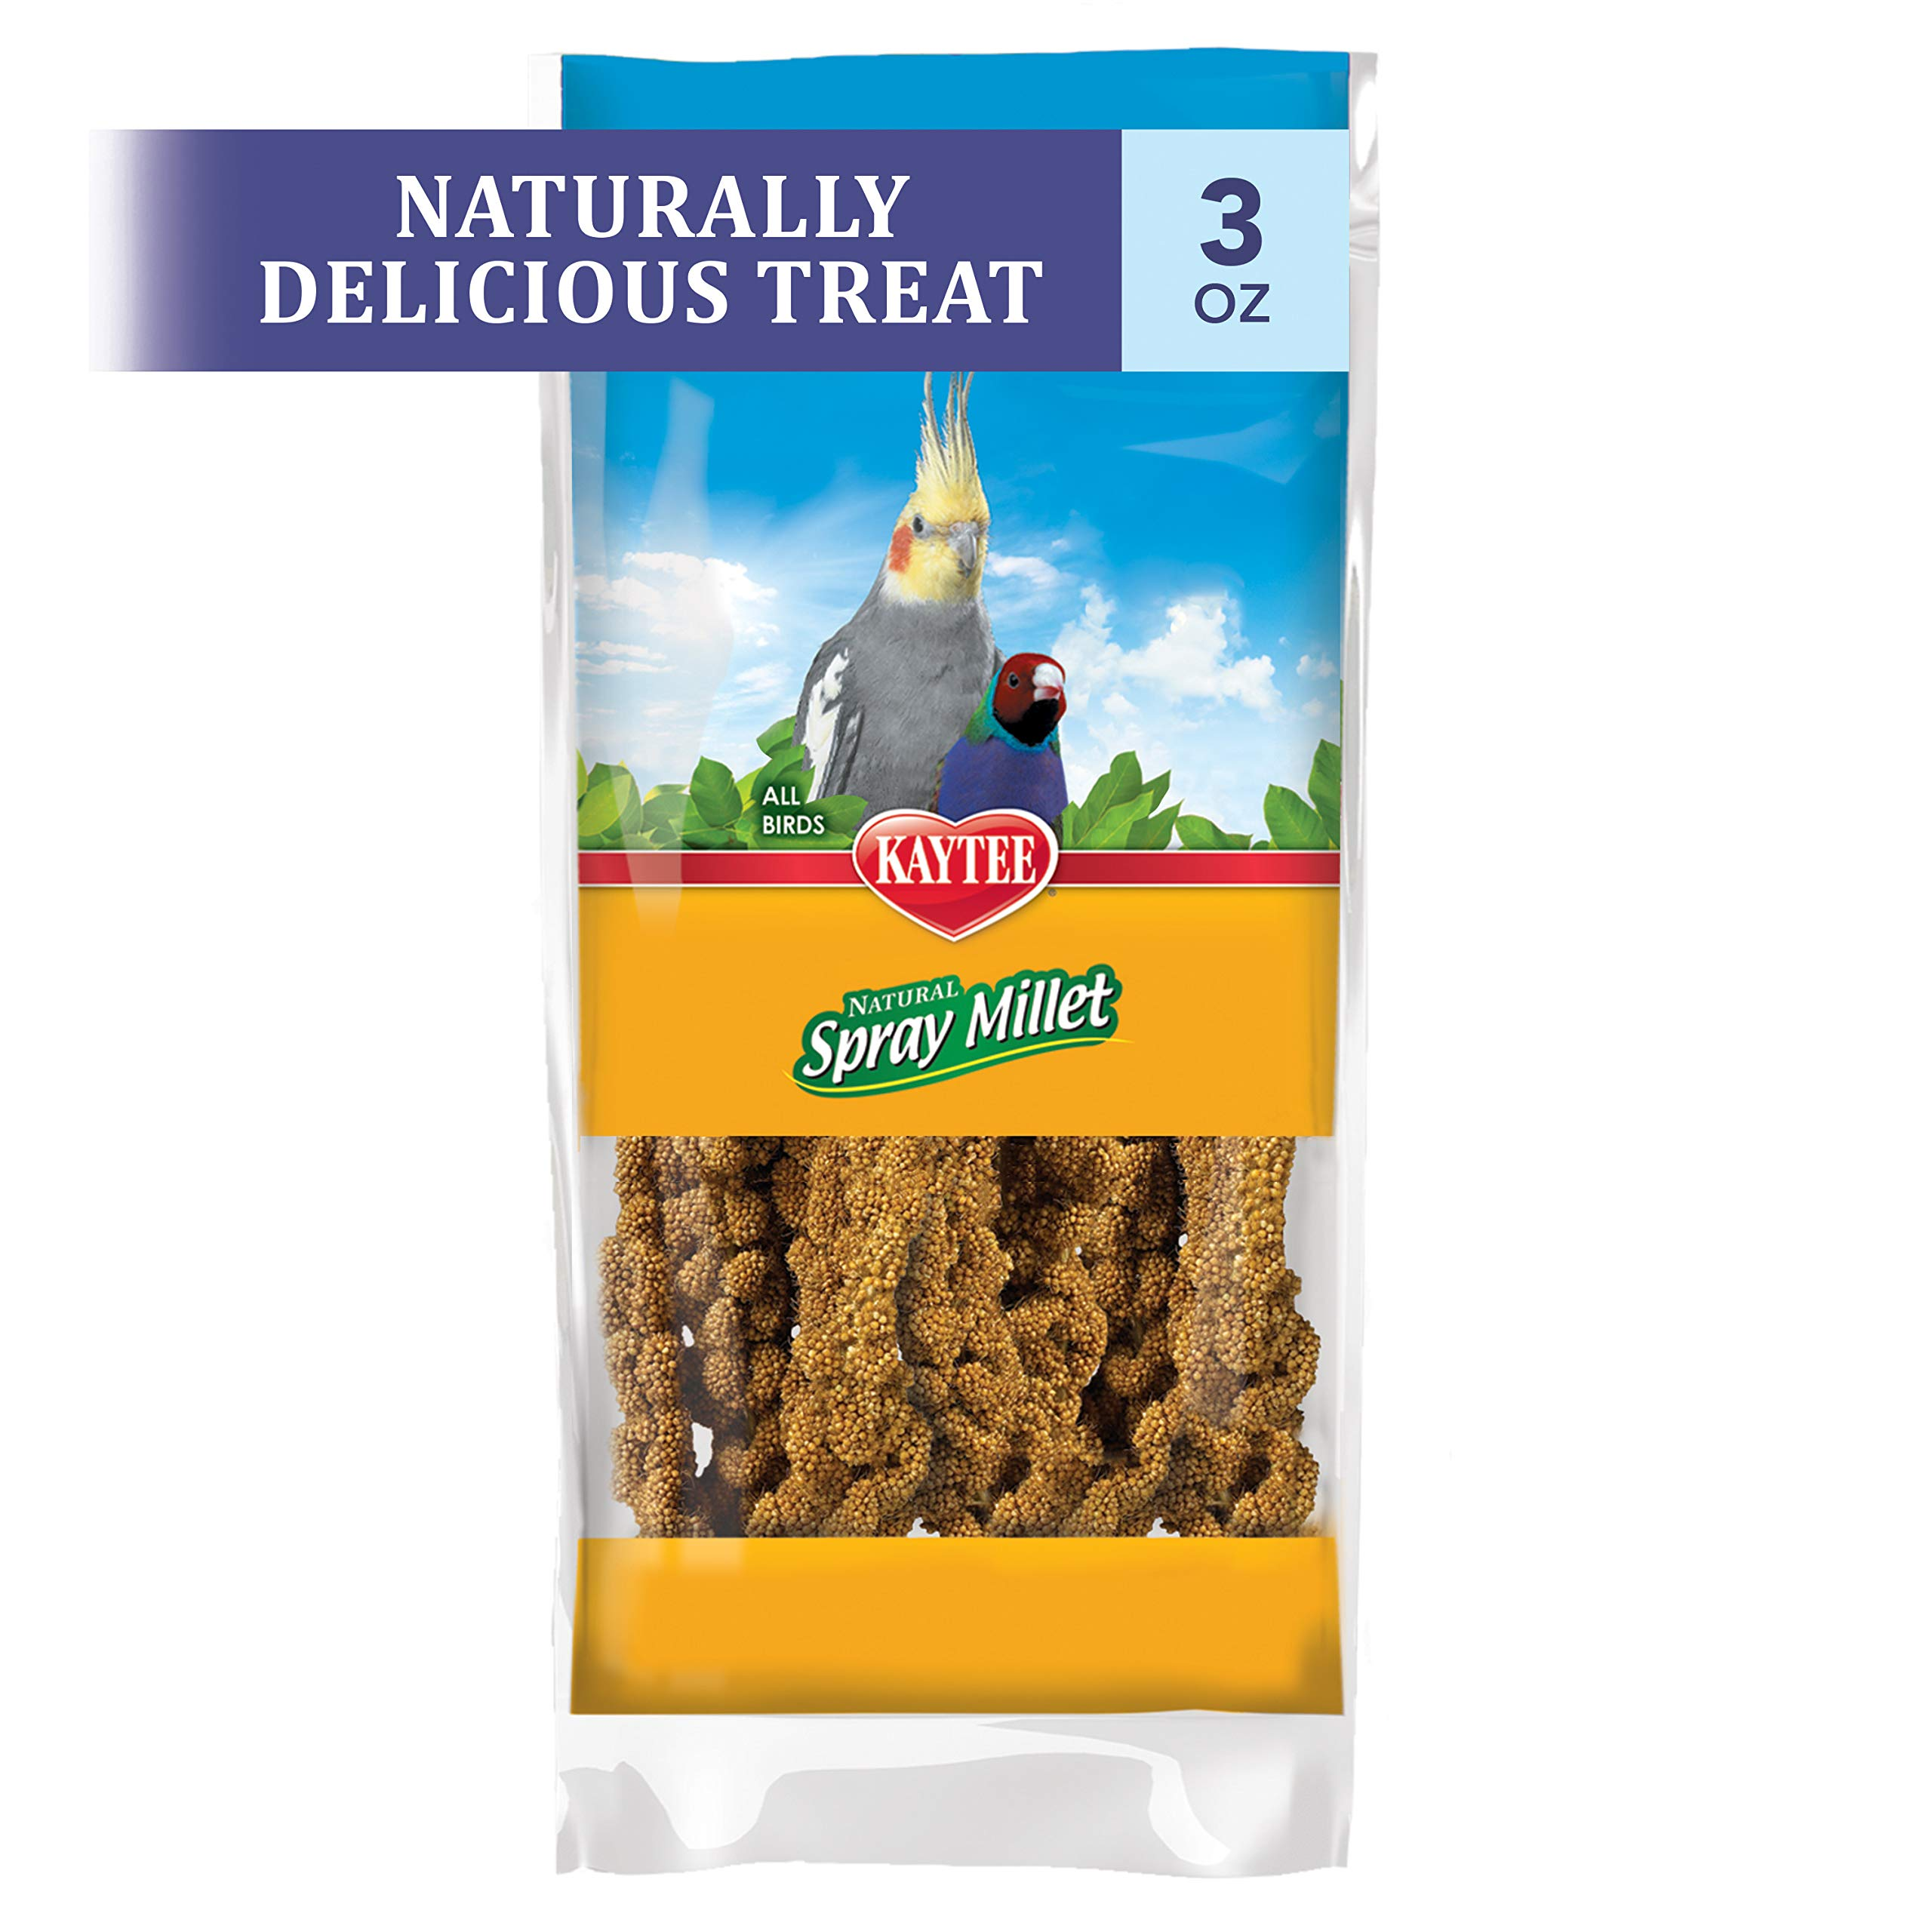 Kaytee Spray Millet For Birds, 6-Count